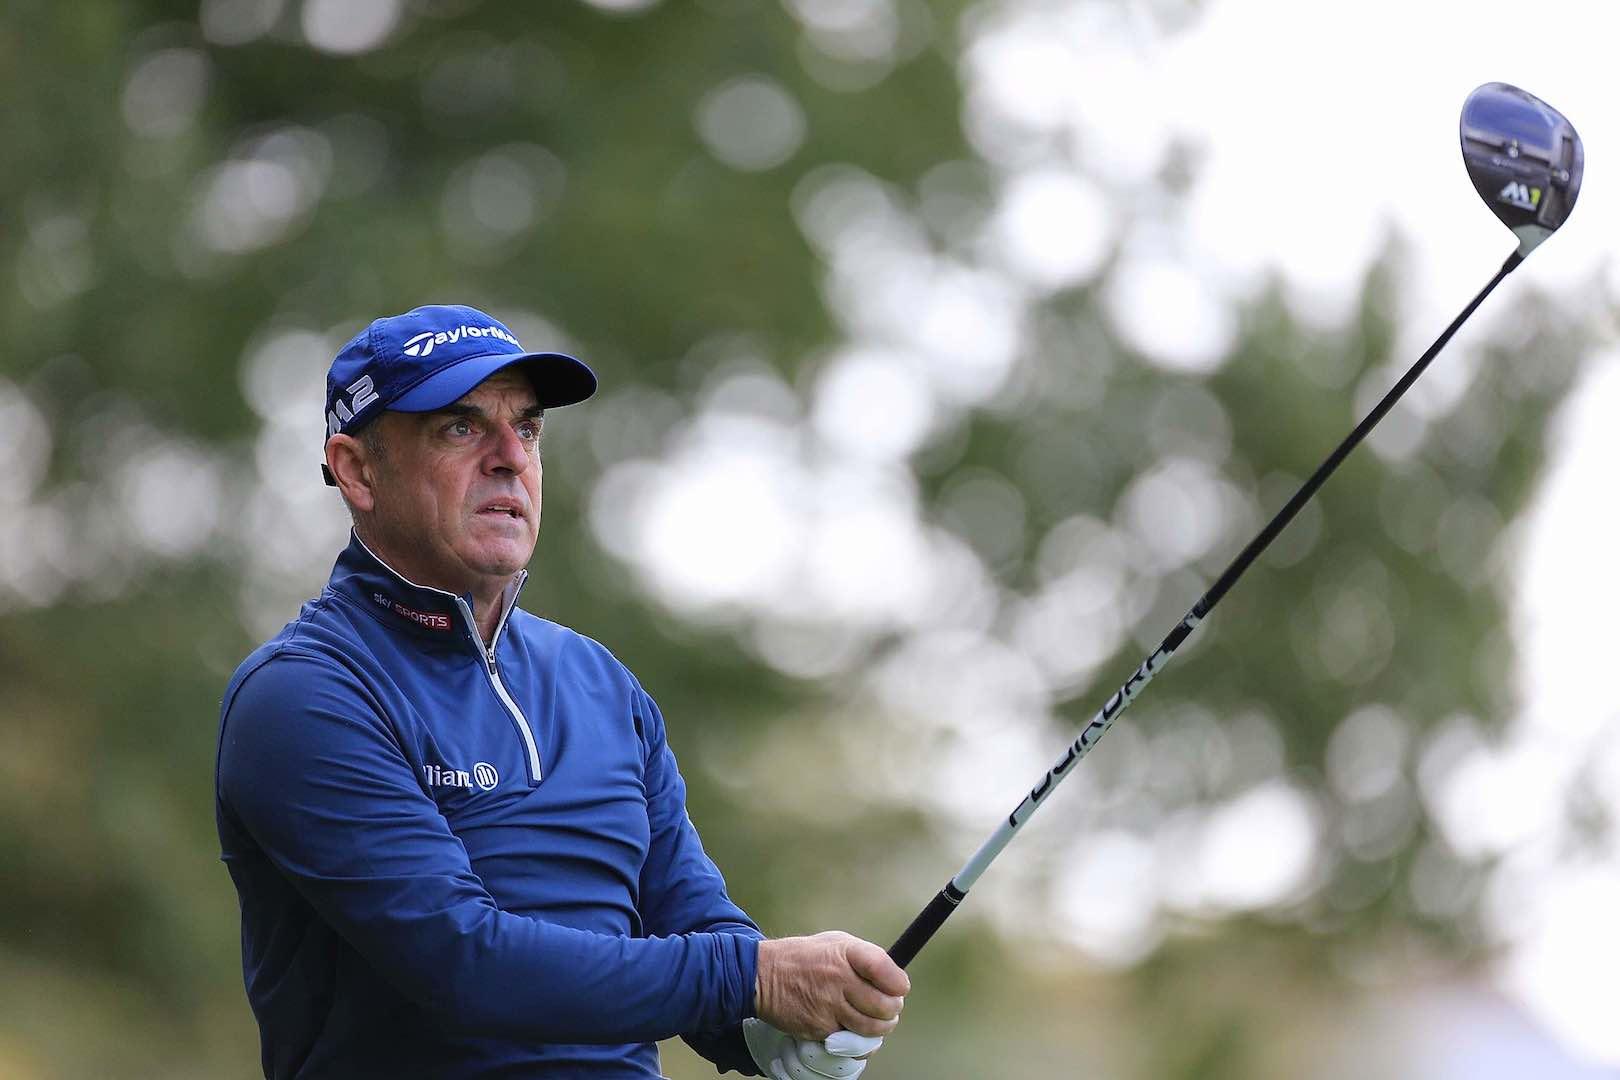 McGinley to make Staysure PGA Seniors Championship debut